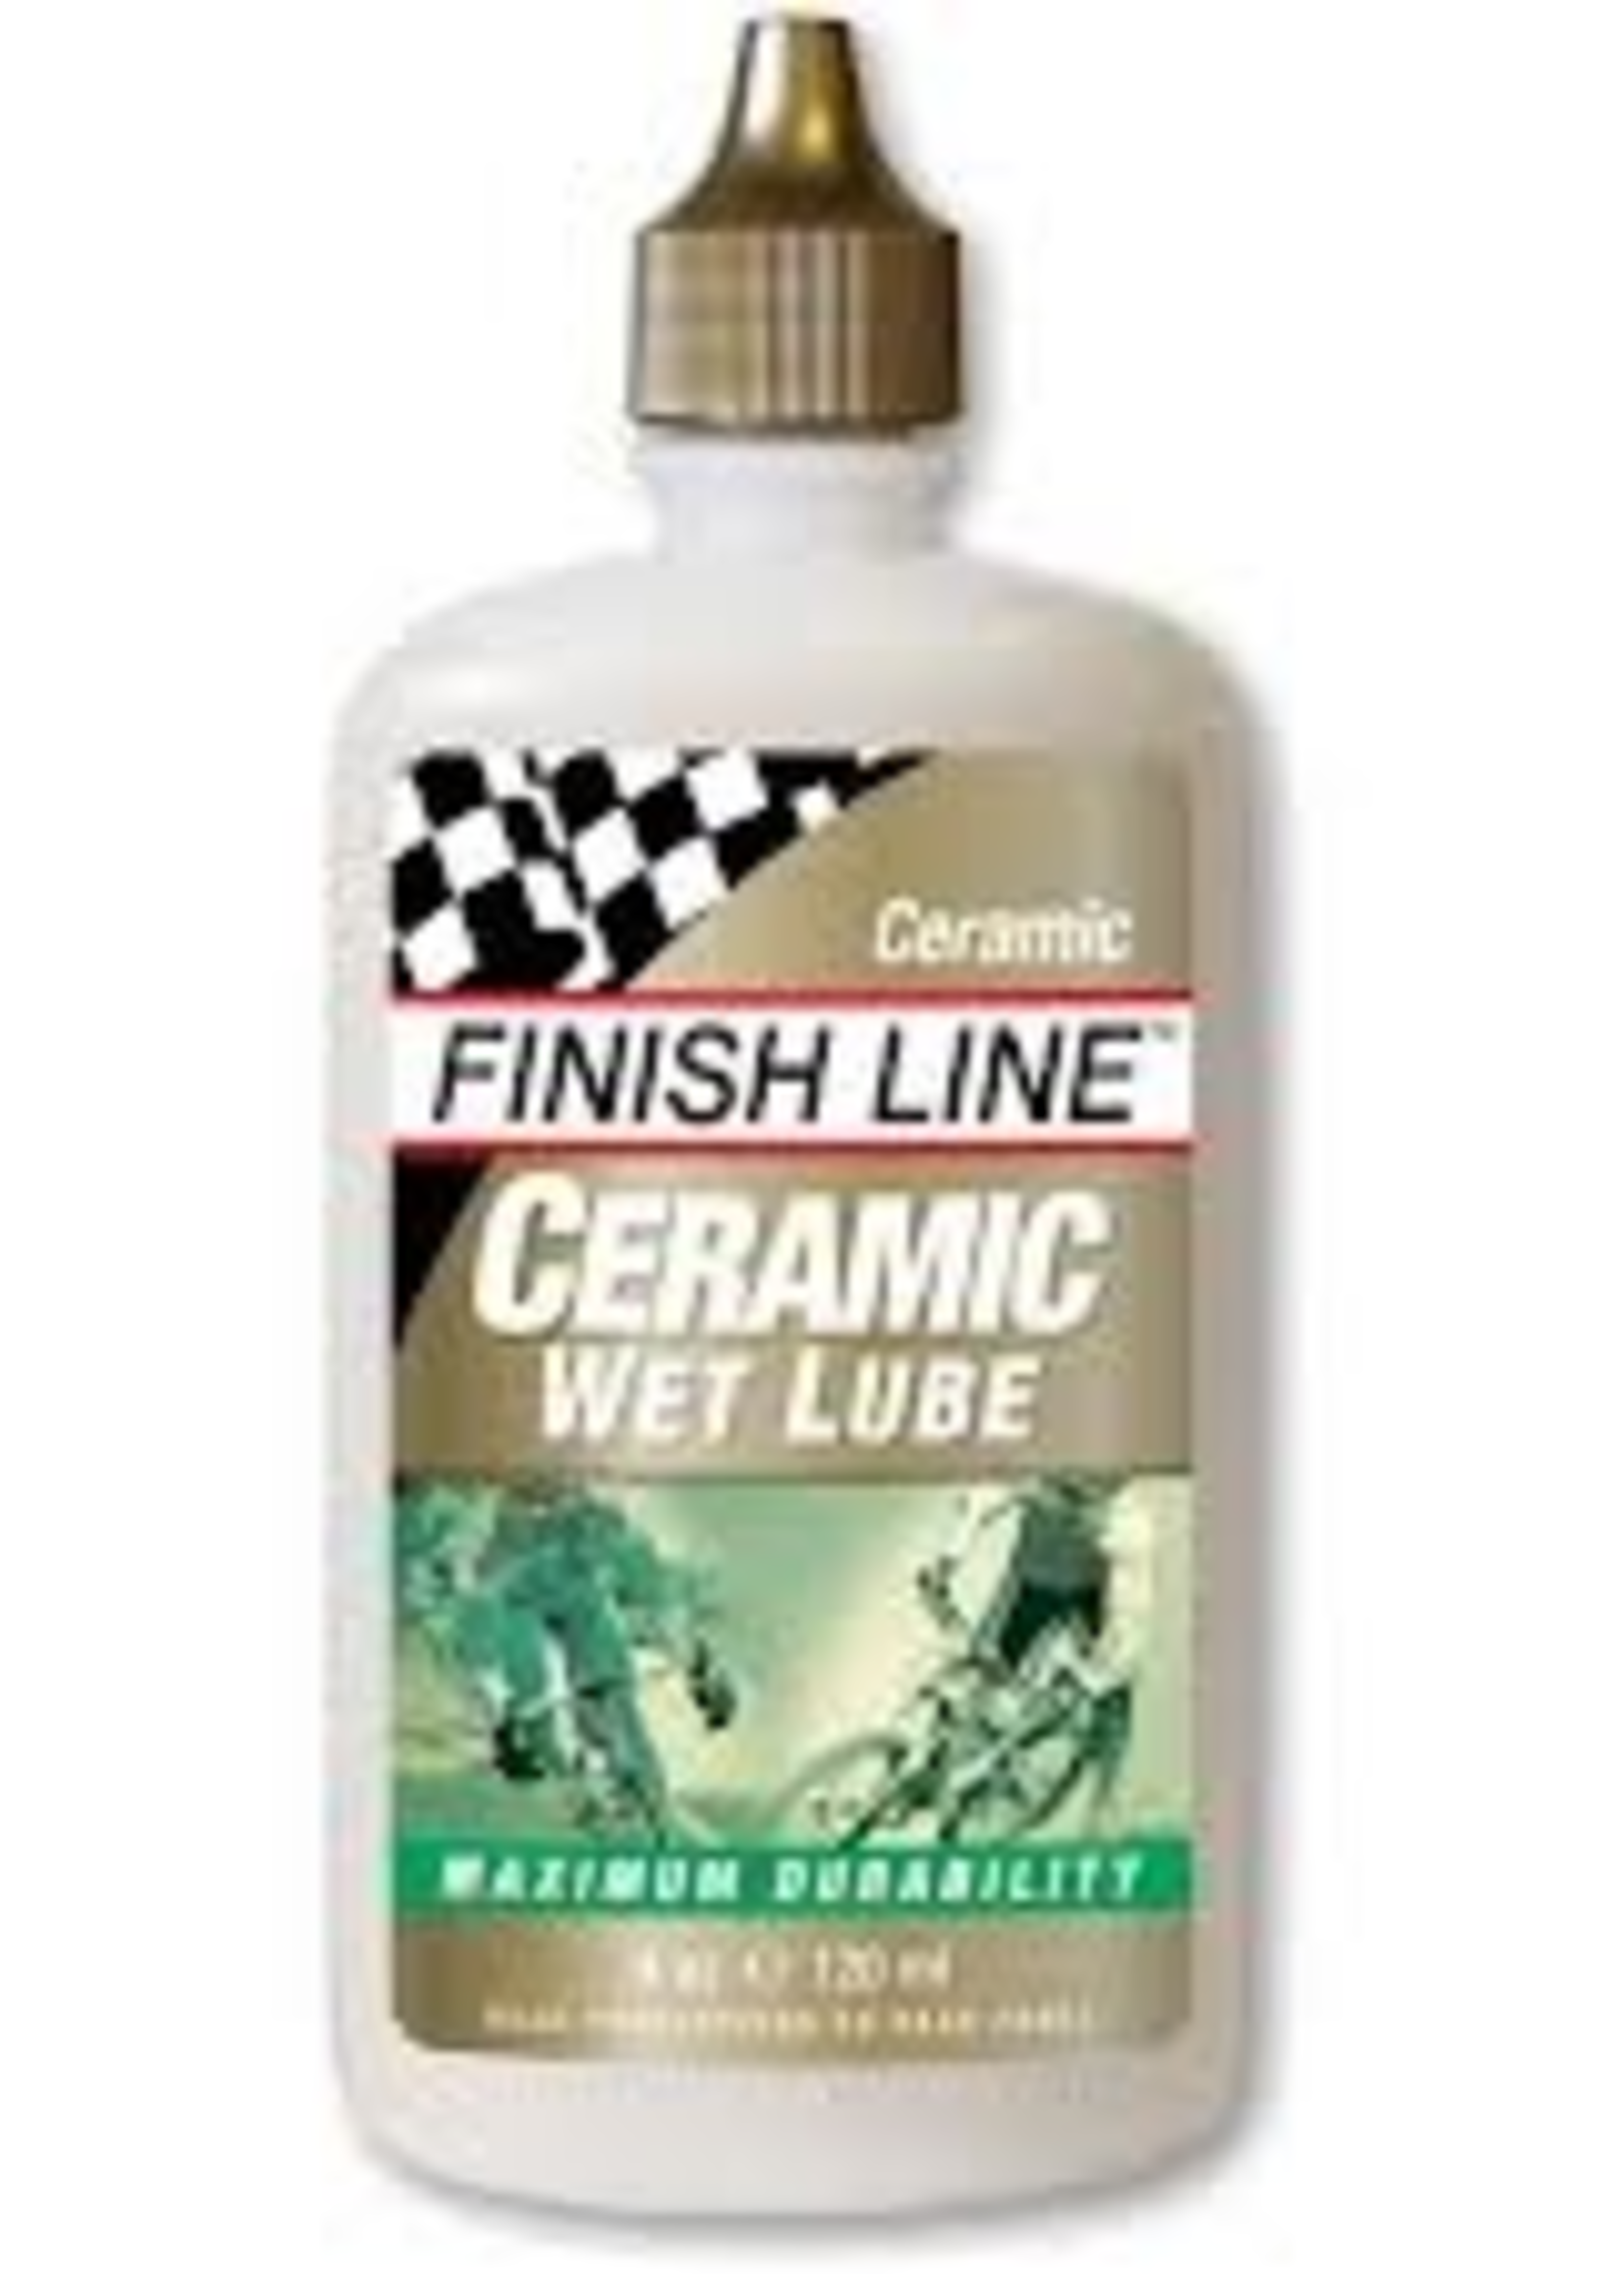 Finish Line FINISH LINE CERAMIC WET LUBE 2 OZ